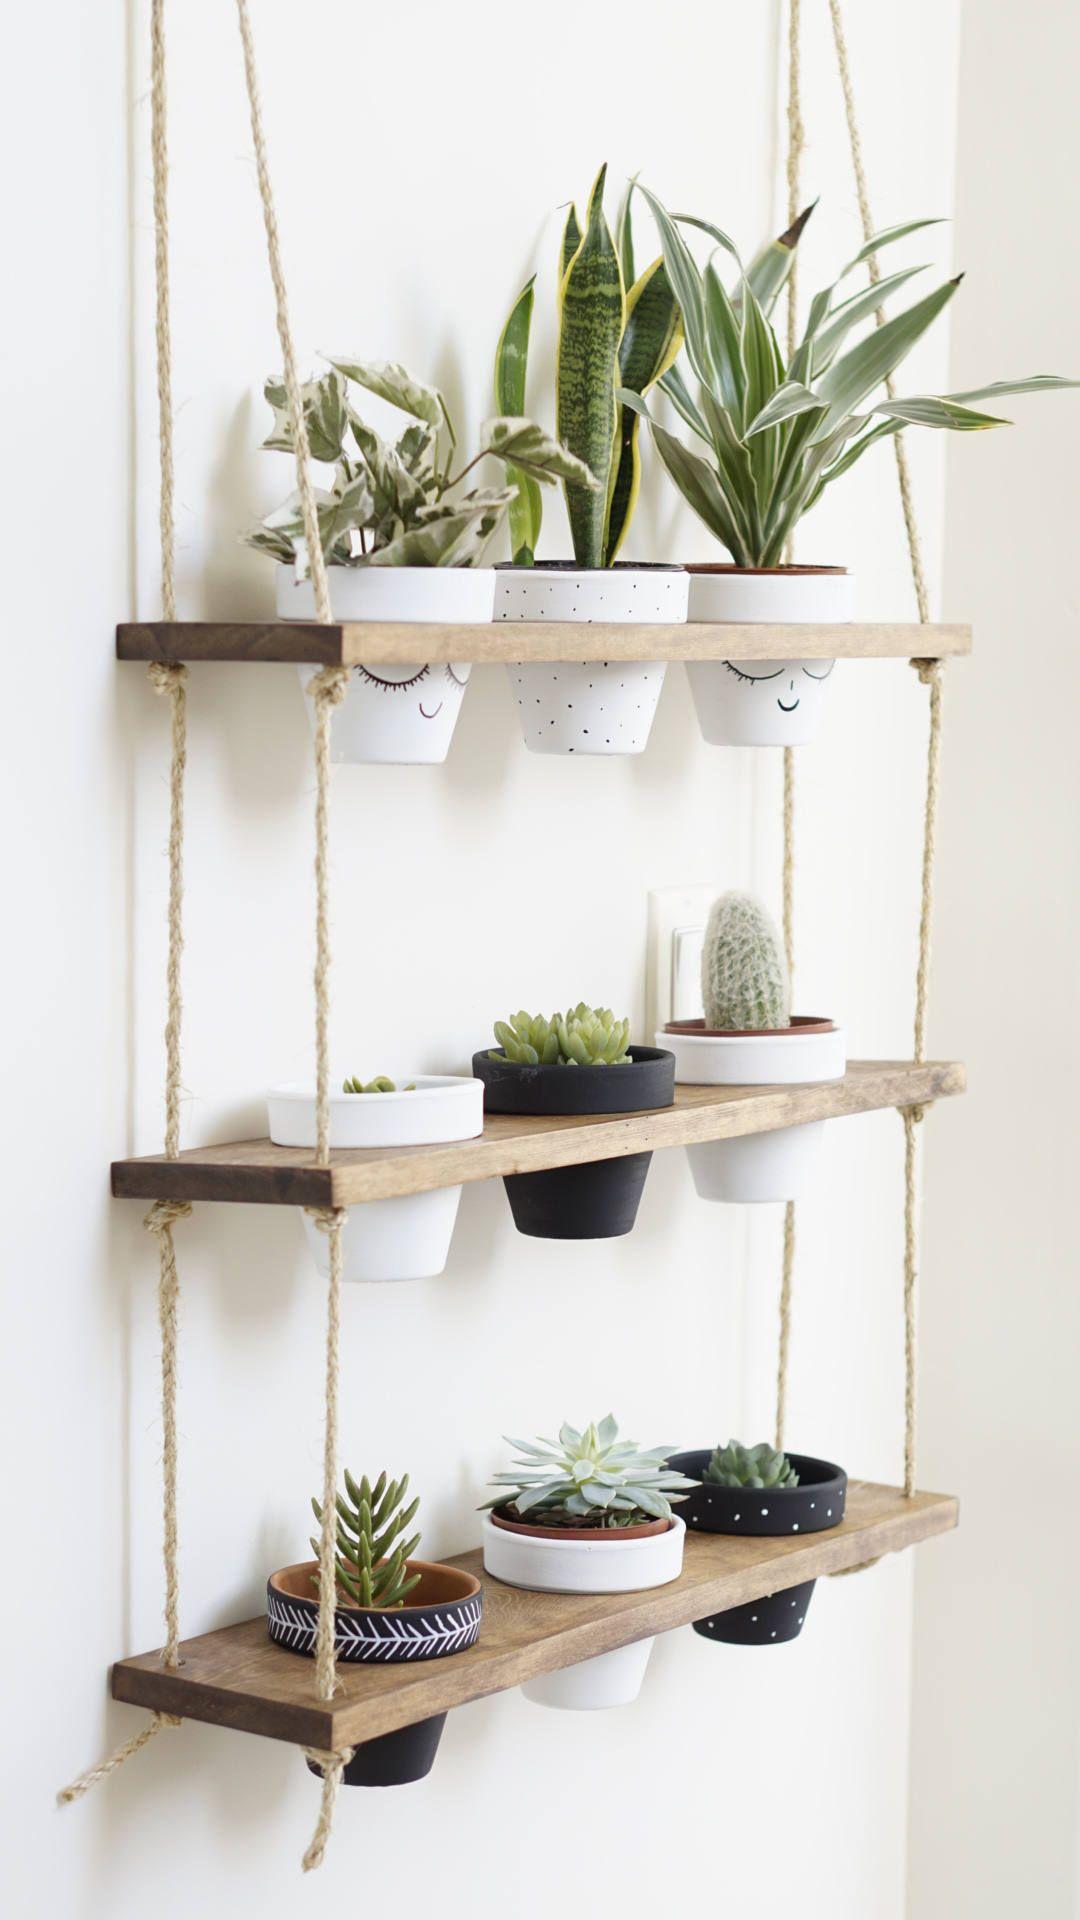 Fabriquer Une Étagère Pour Plantes tribeca trio pot shelf / hanging shelves / planter shelves